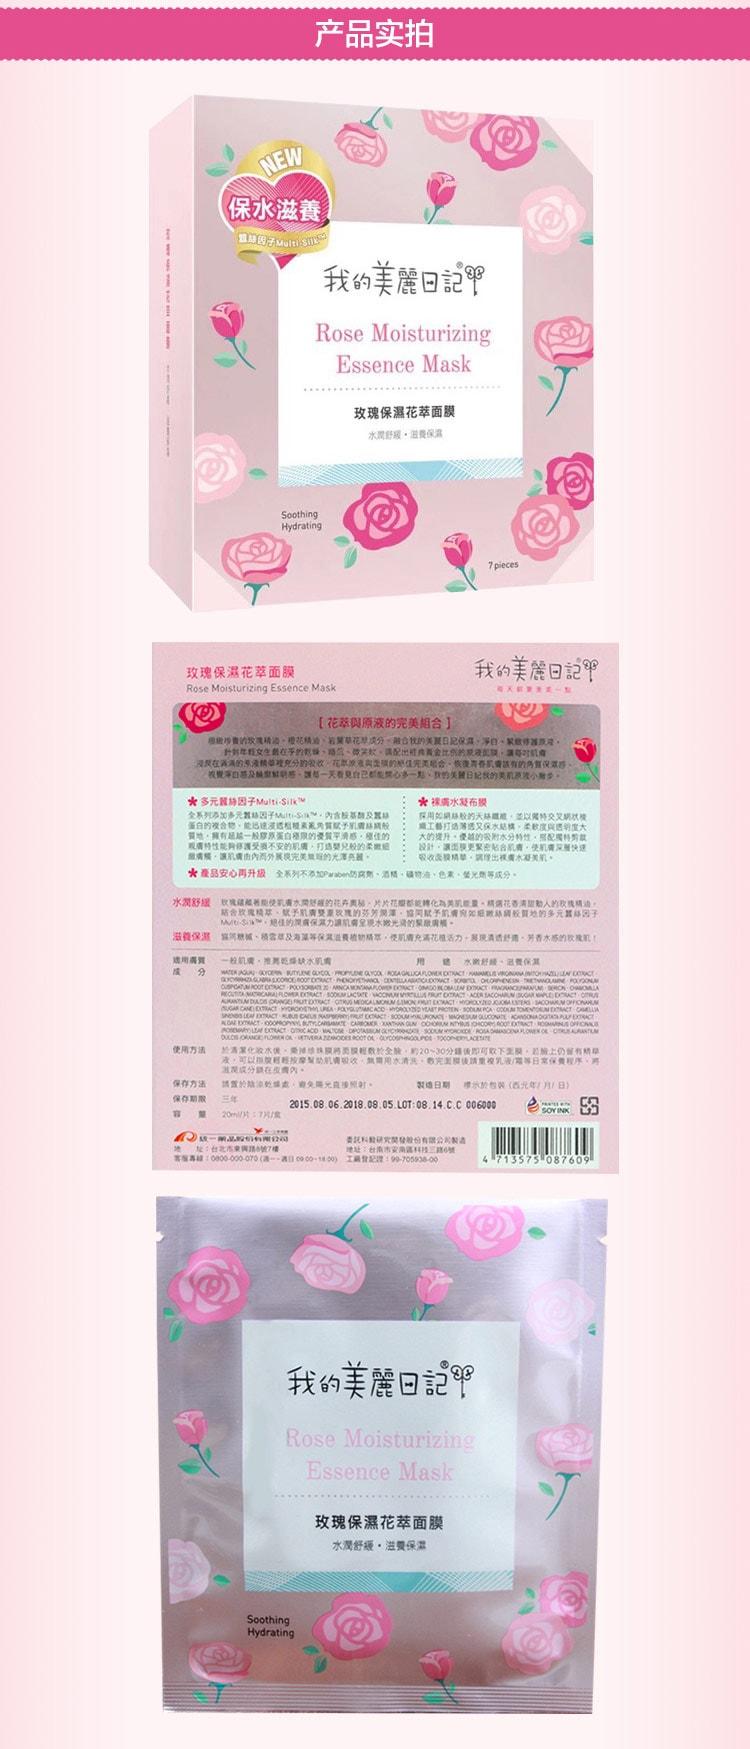 Rose Moisturizing Essence Mask - Packaging